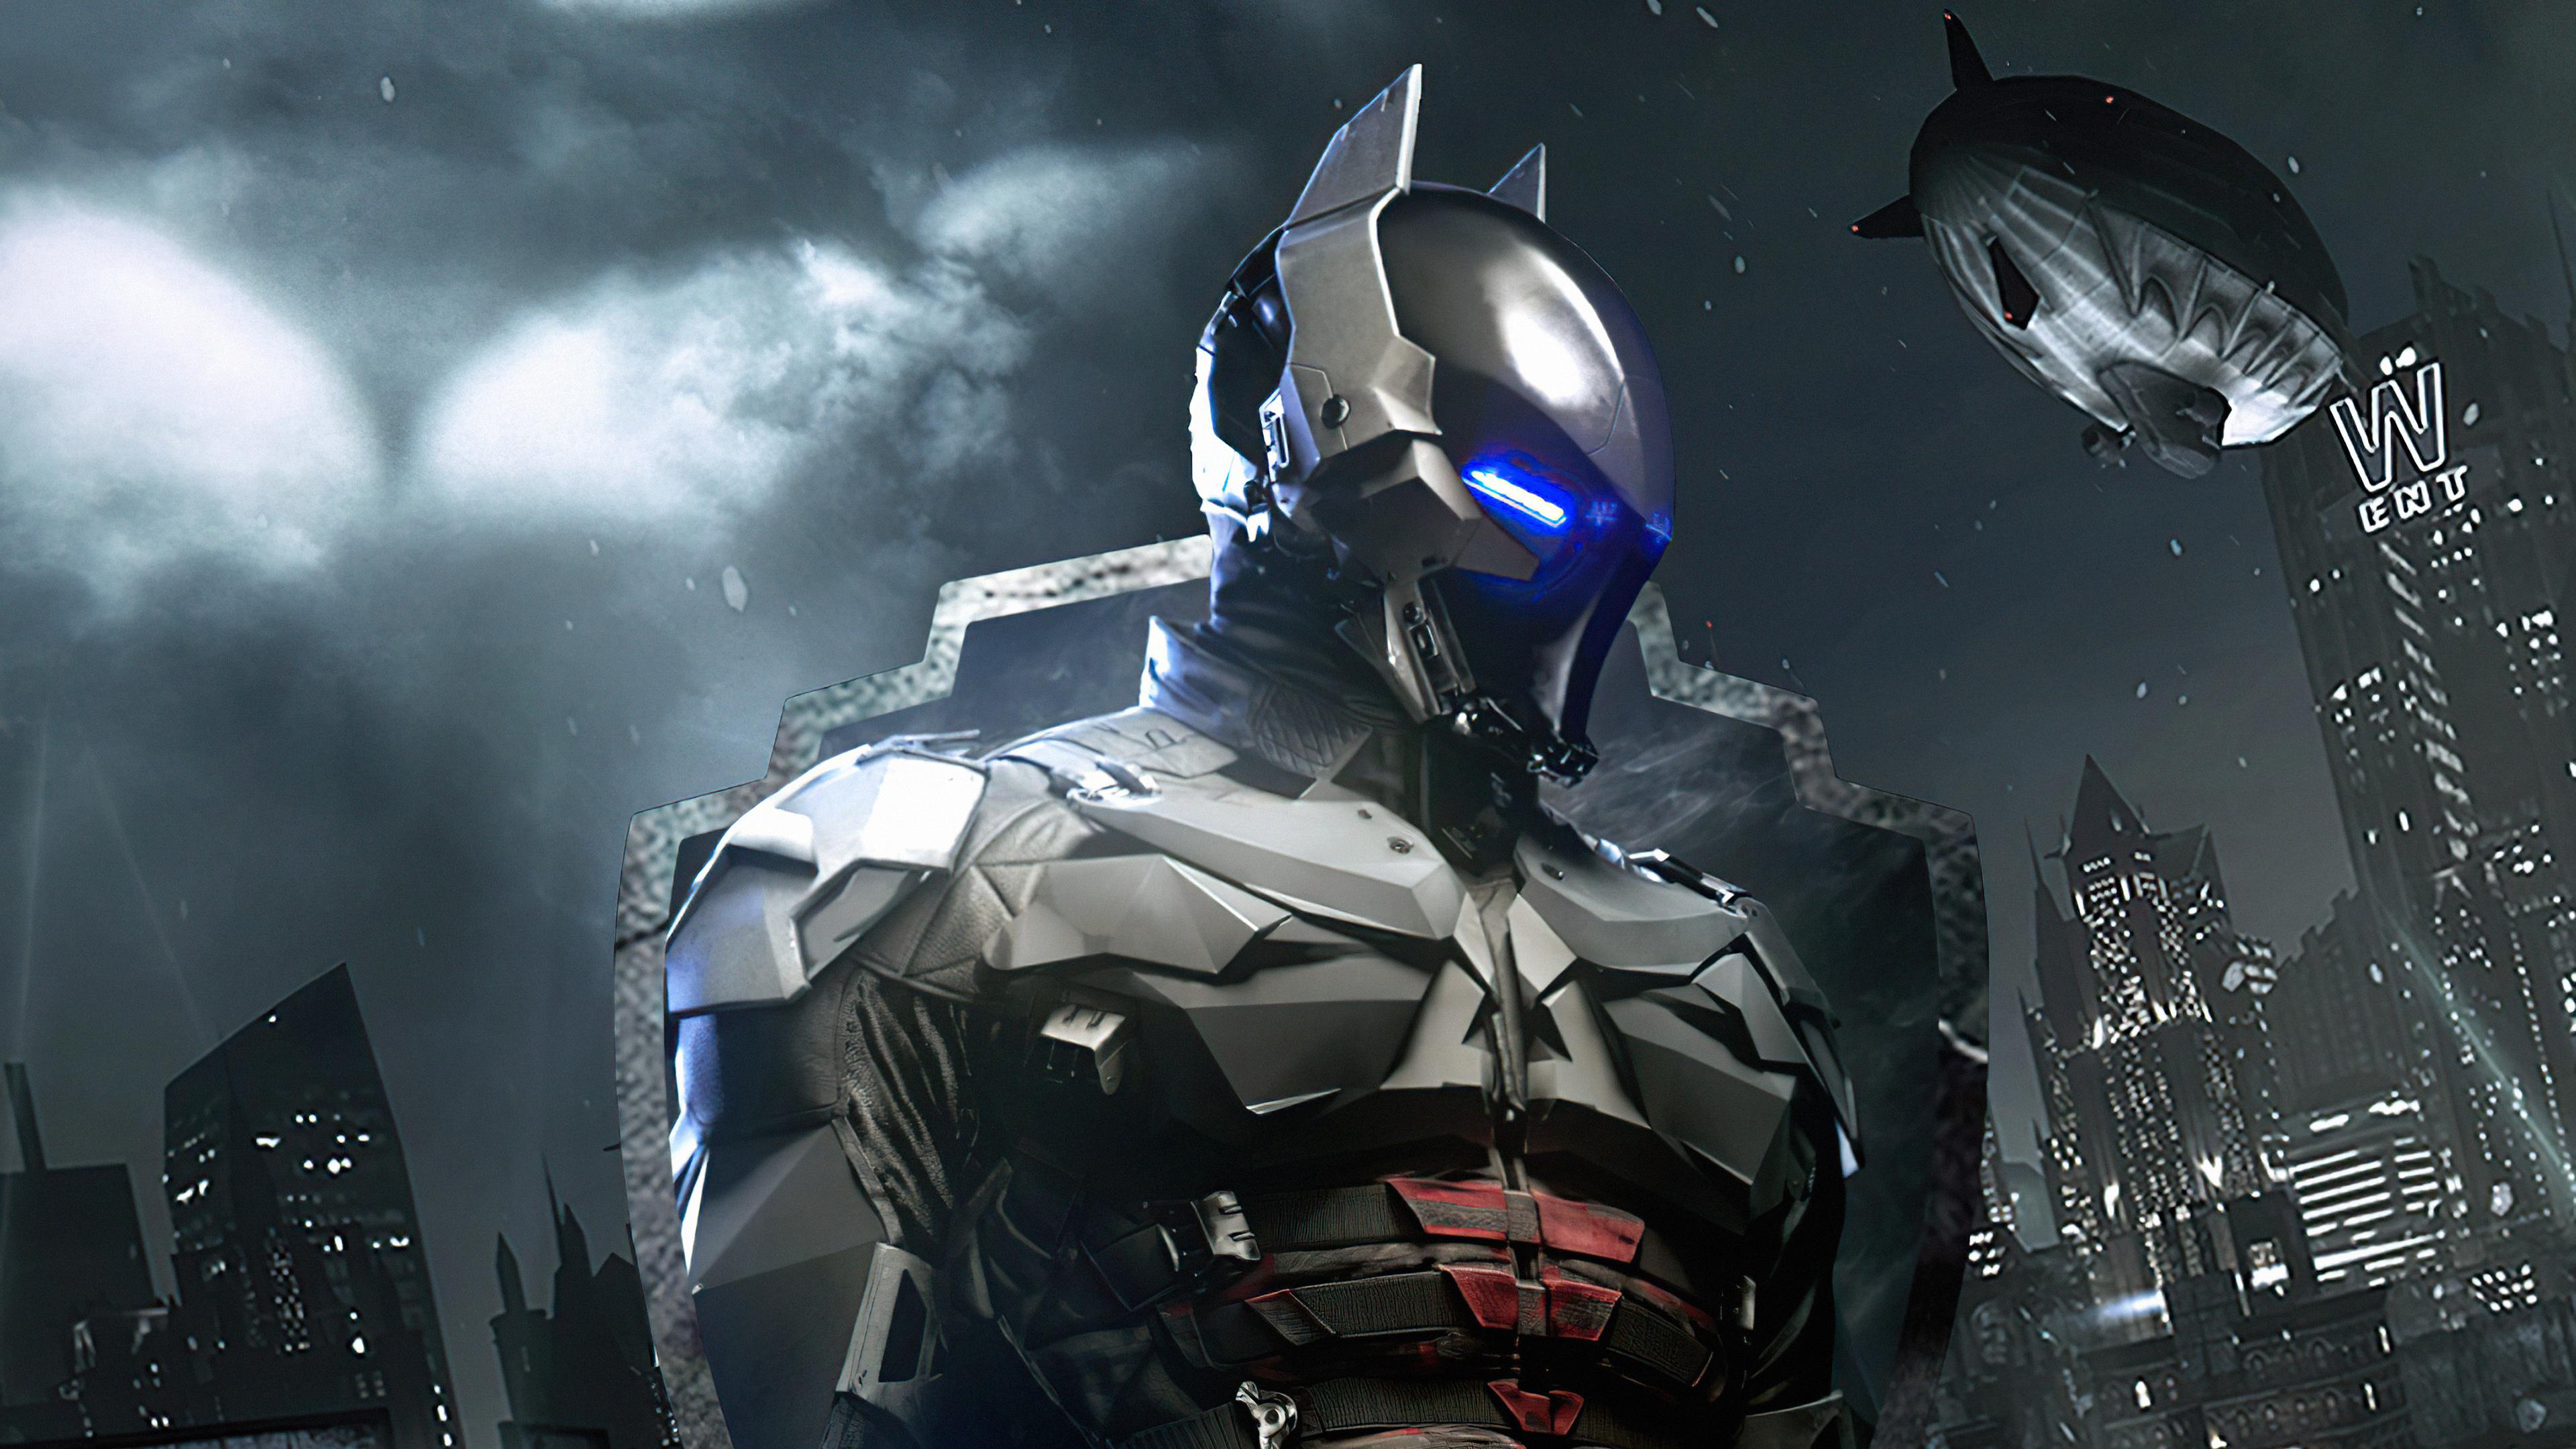 batman arkham knight x warner bros 4k 1616955318 - Batman Arkham Knight X Warner Bros 4k - Batman Arkham Knight X Warner Bros 4k wallpapers